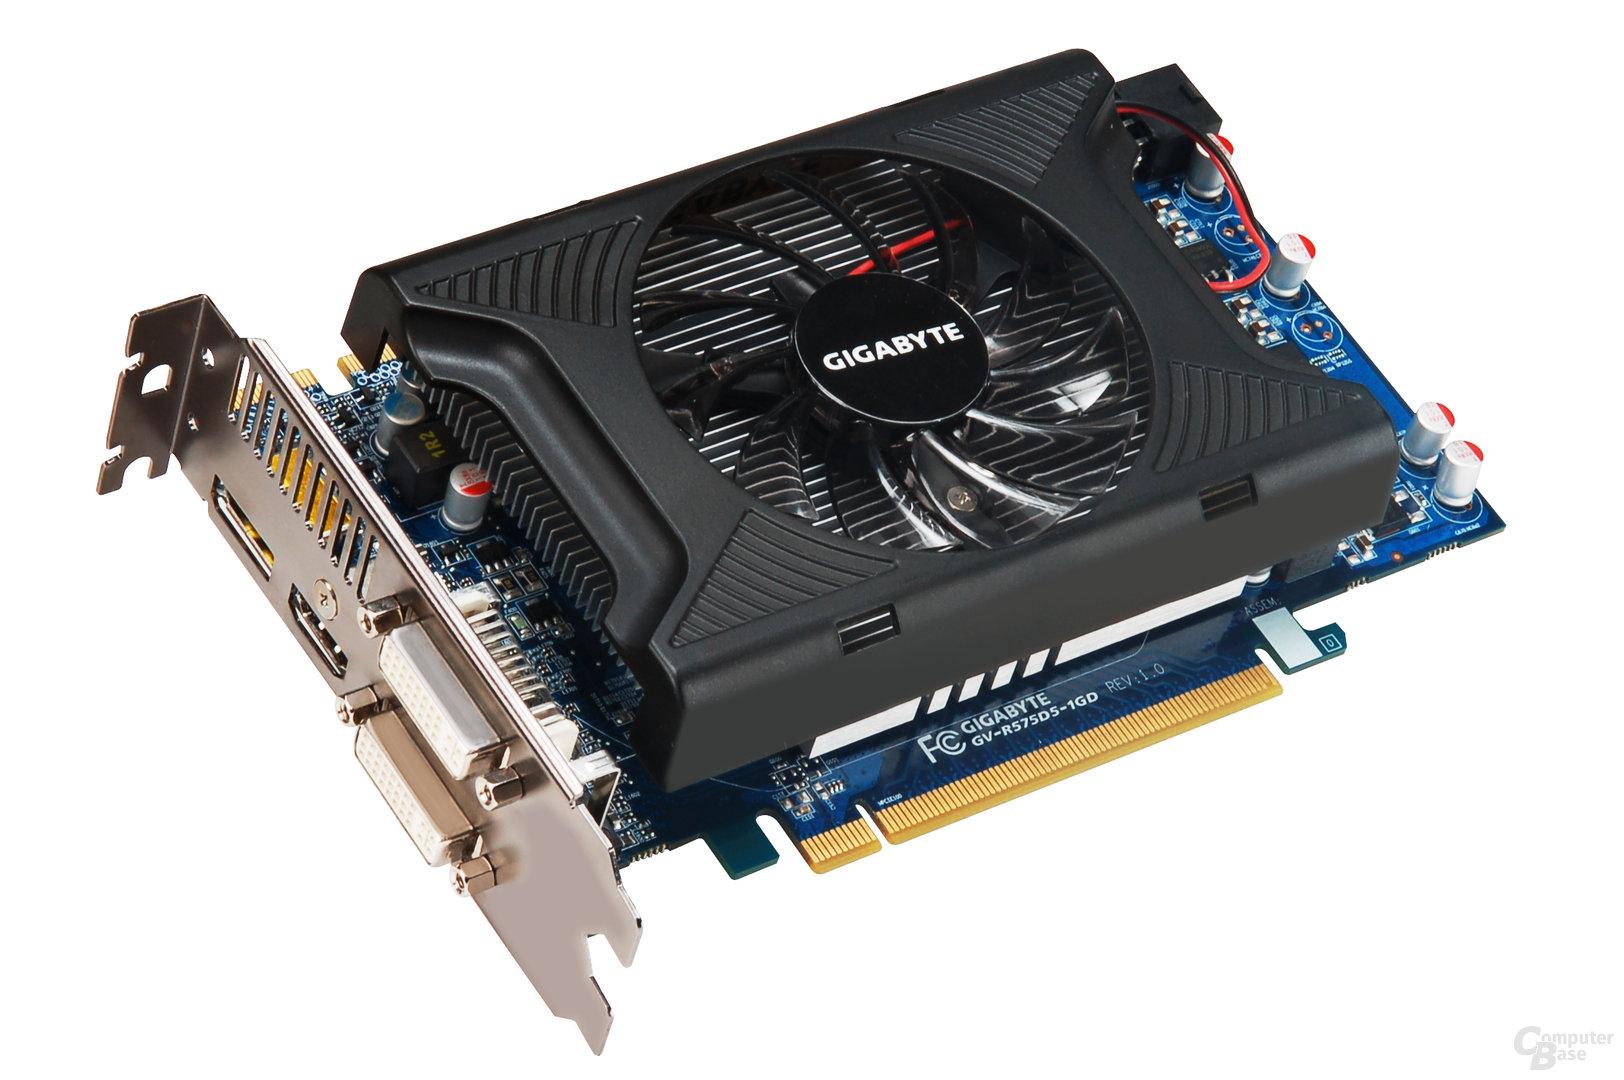 Gigabyte Radeon HD 5750